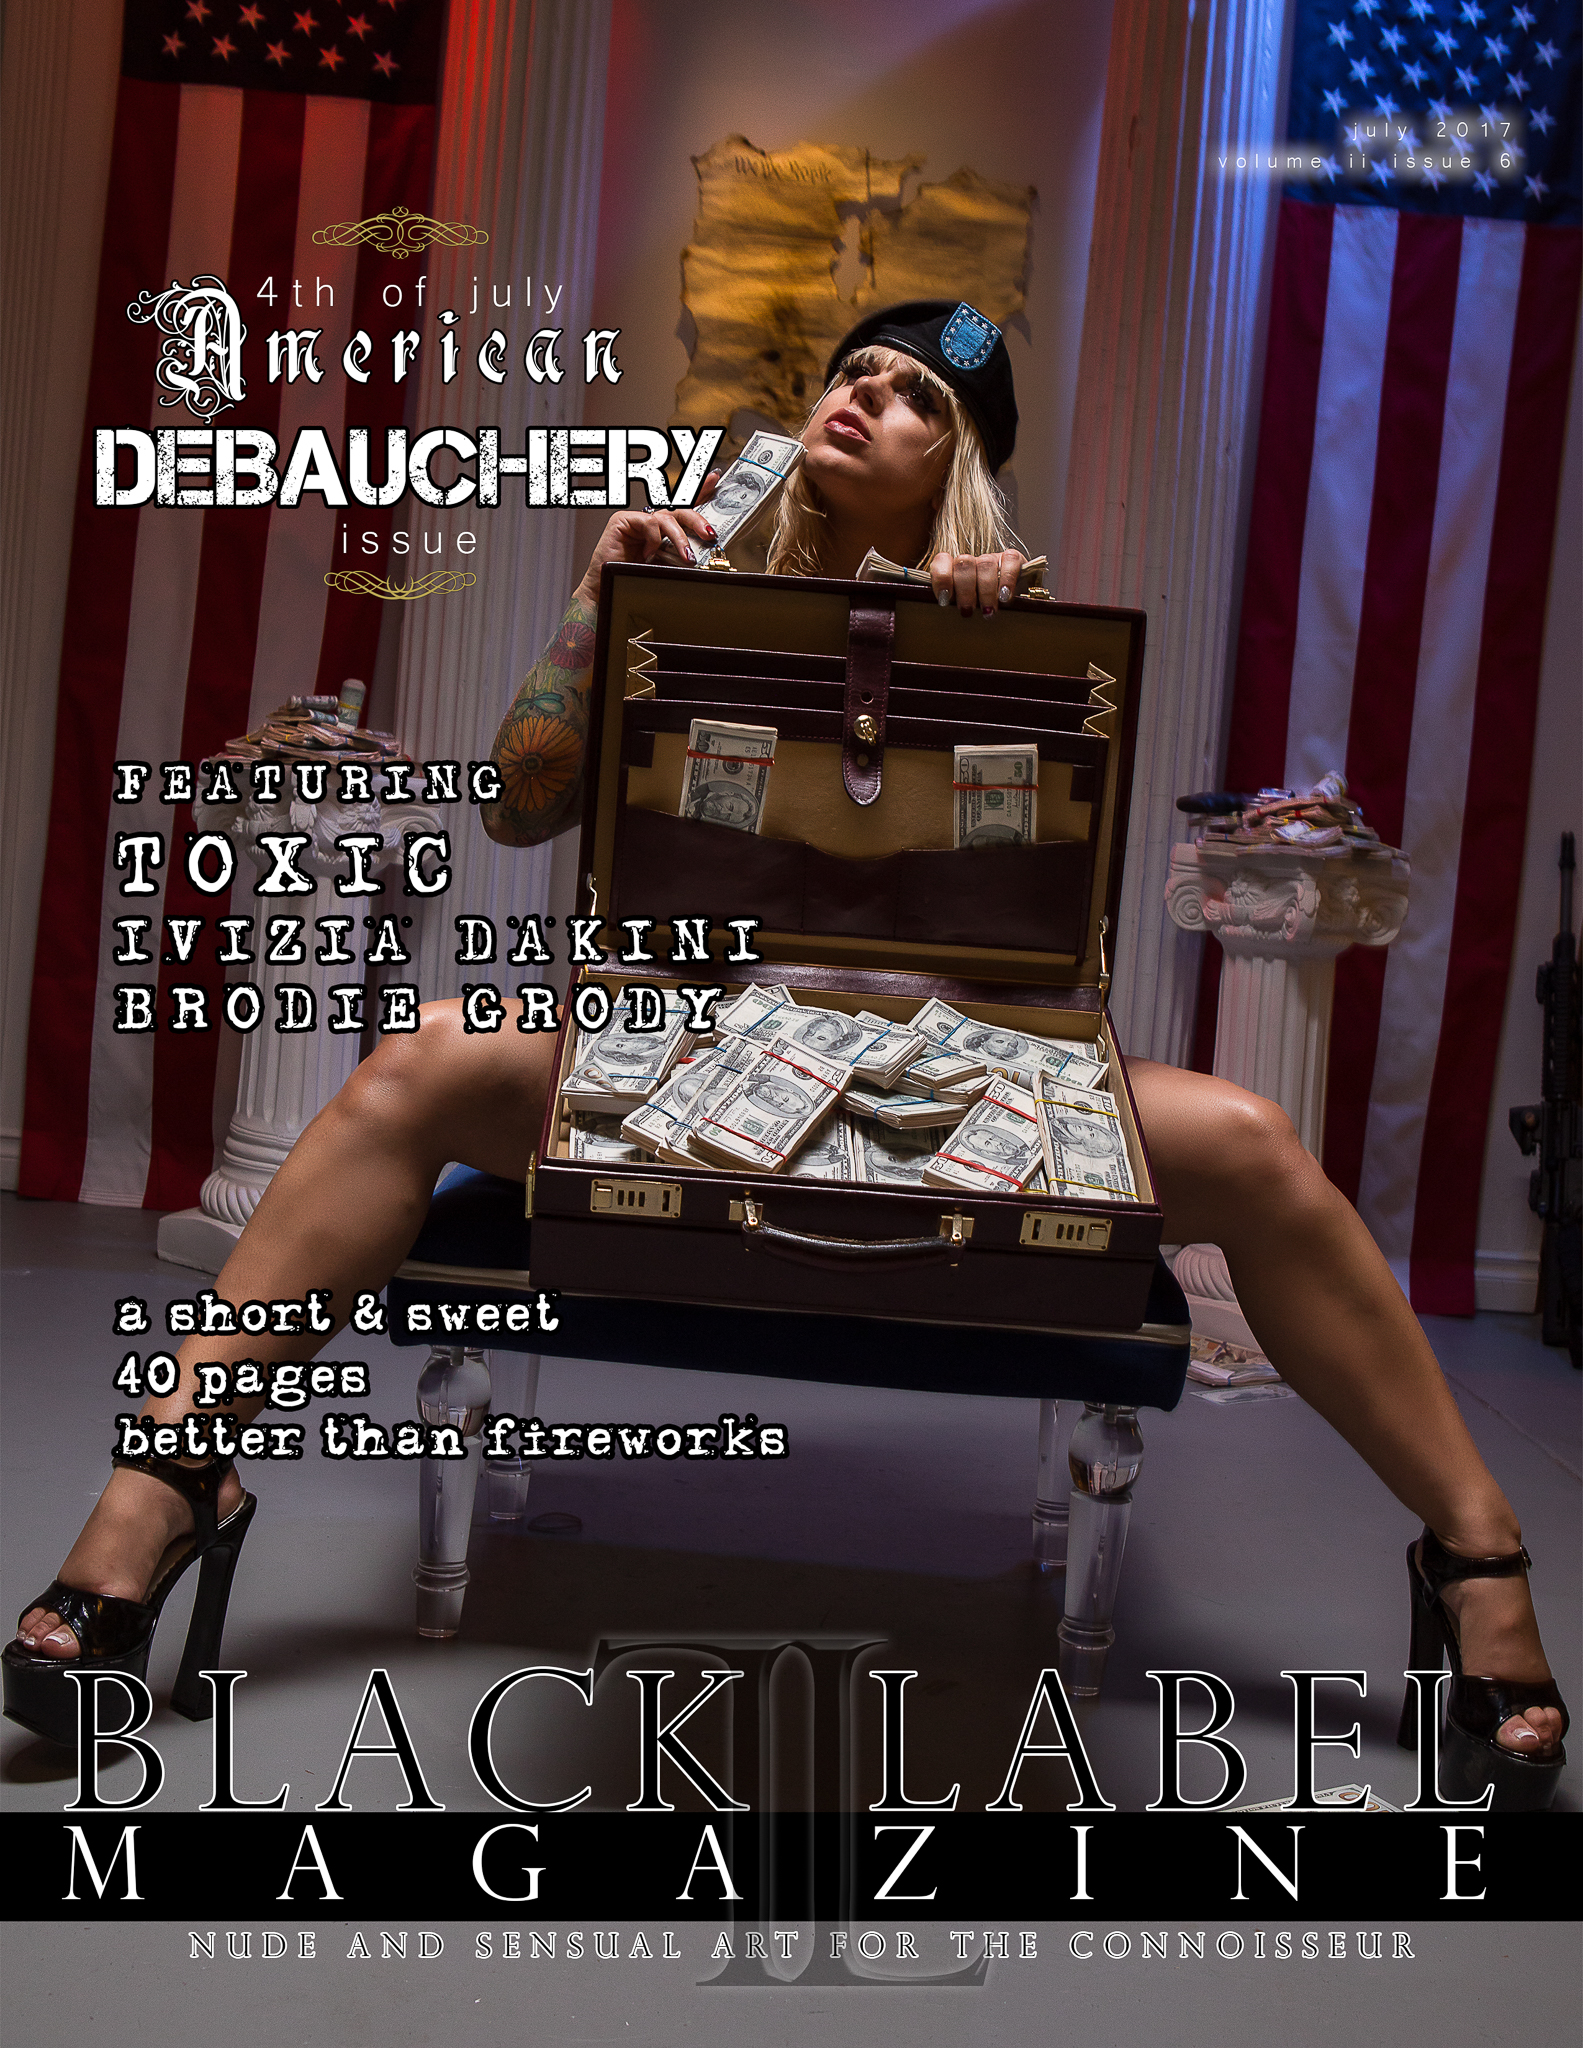 4th of July, nudes, models, nude art, exotic art, burlesque models, nude models, inflammatory, politics, #makeamericagreatagain